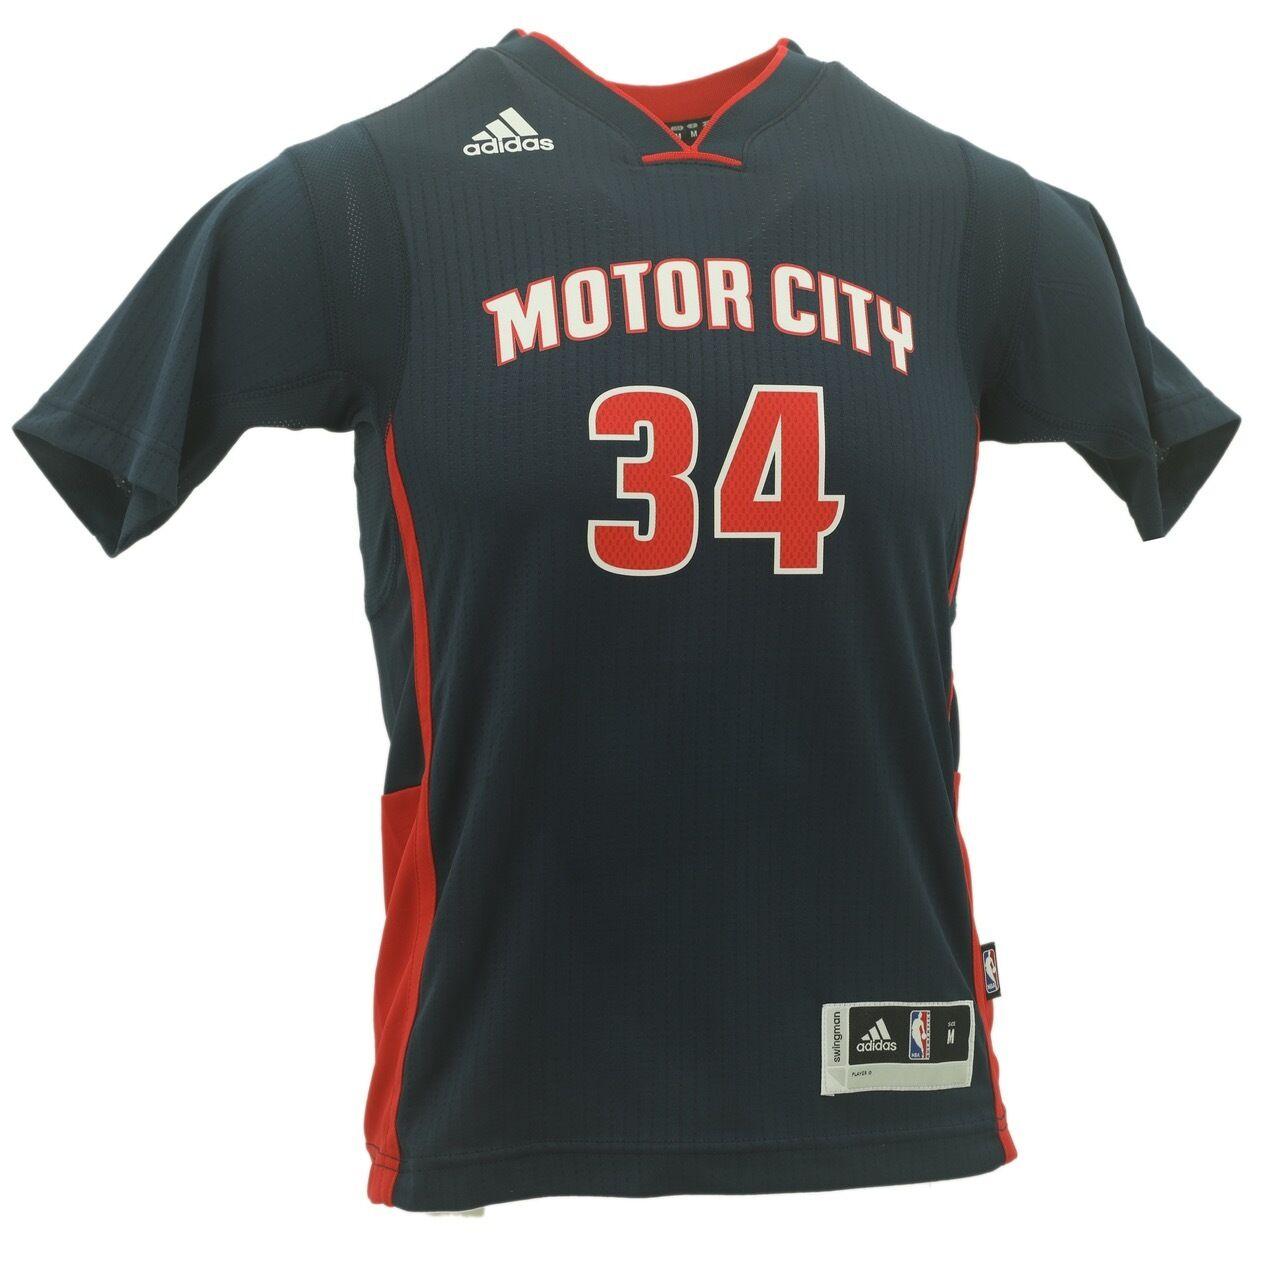 Adidas Tobias Harris Youth Size Detroit Pistons NBA Swingman Jersey New  With Tag 9f21d8dea